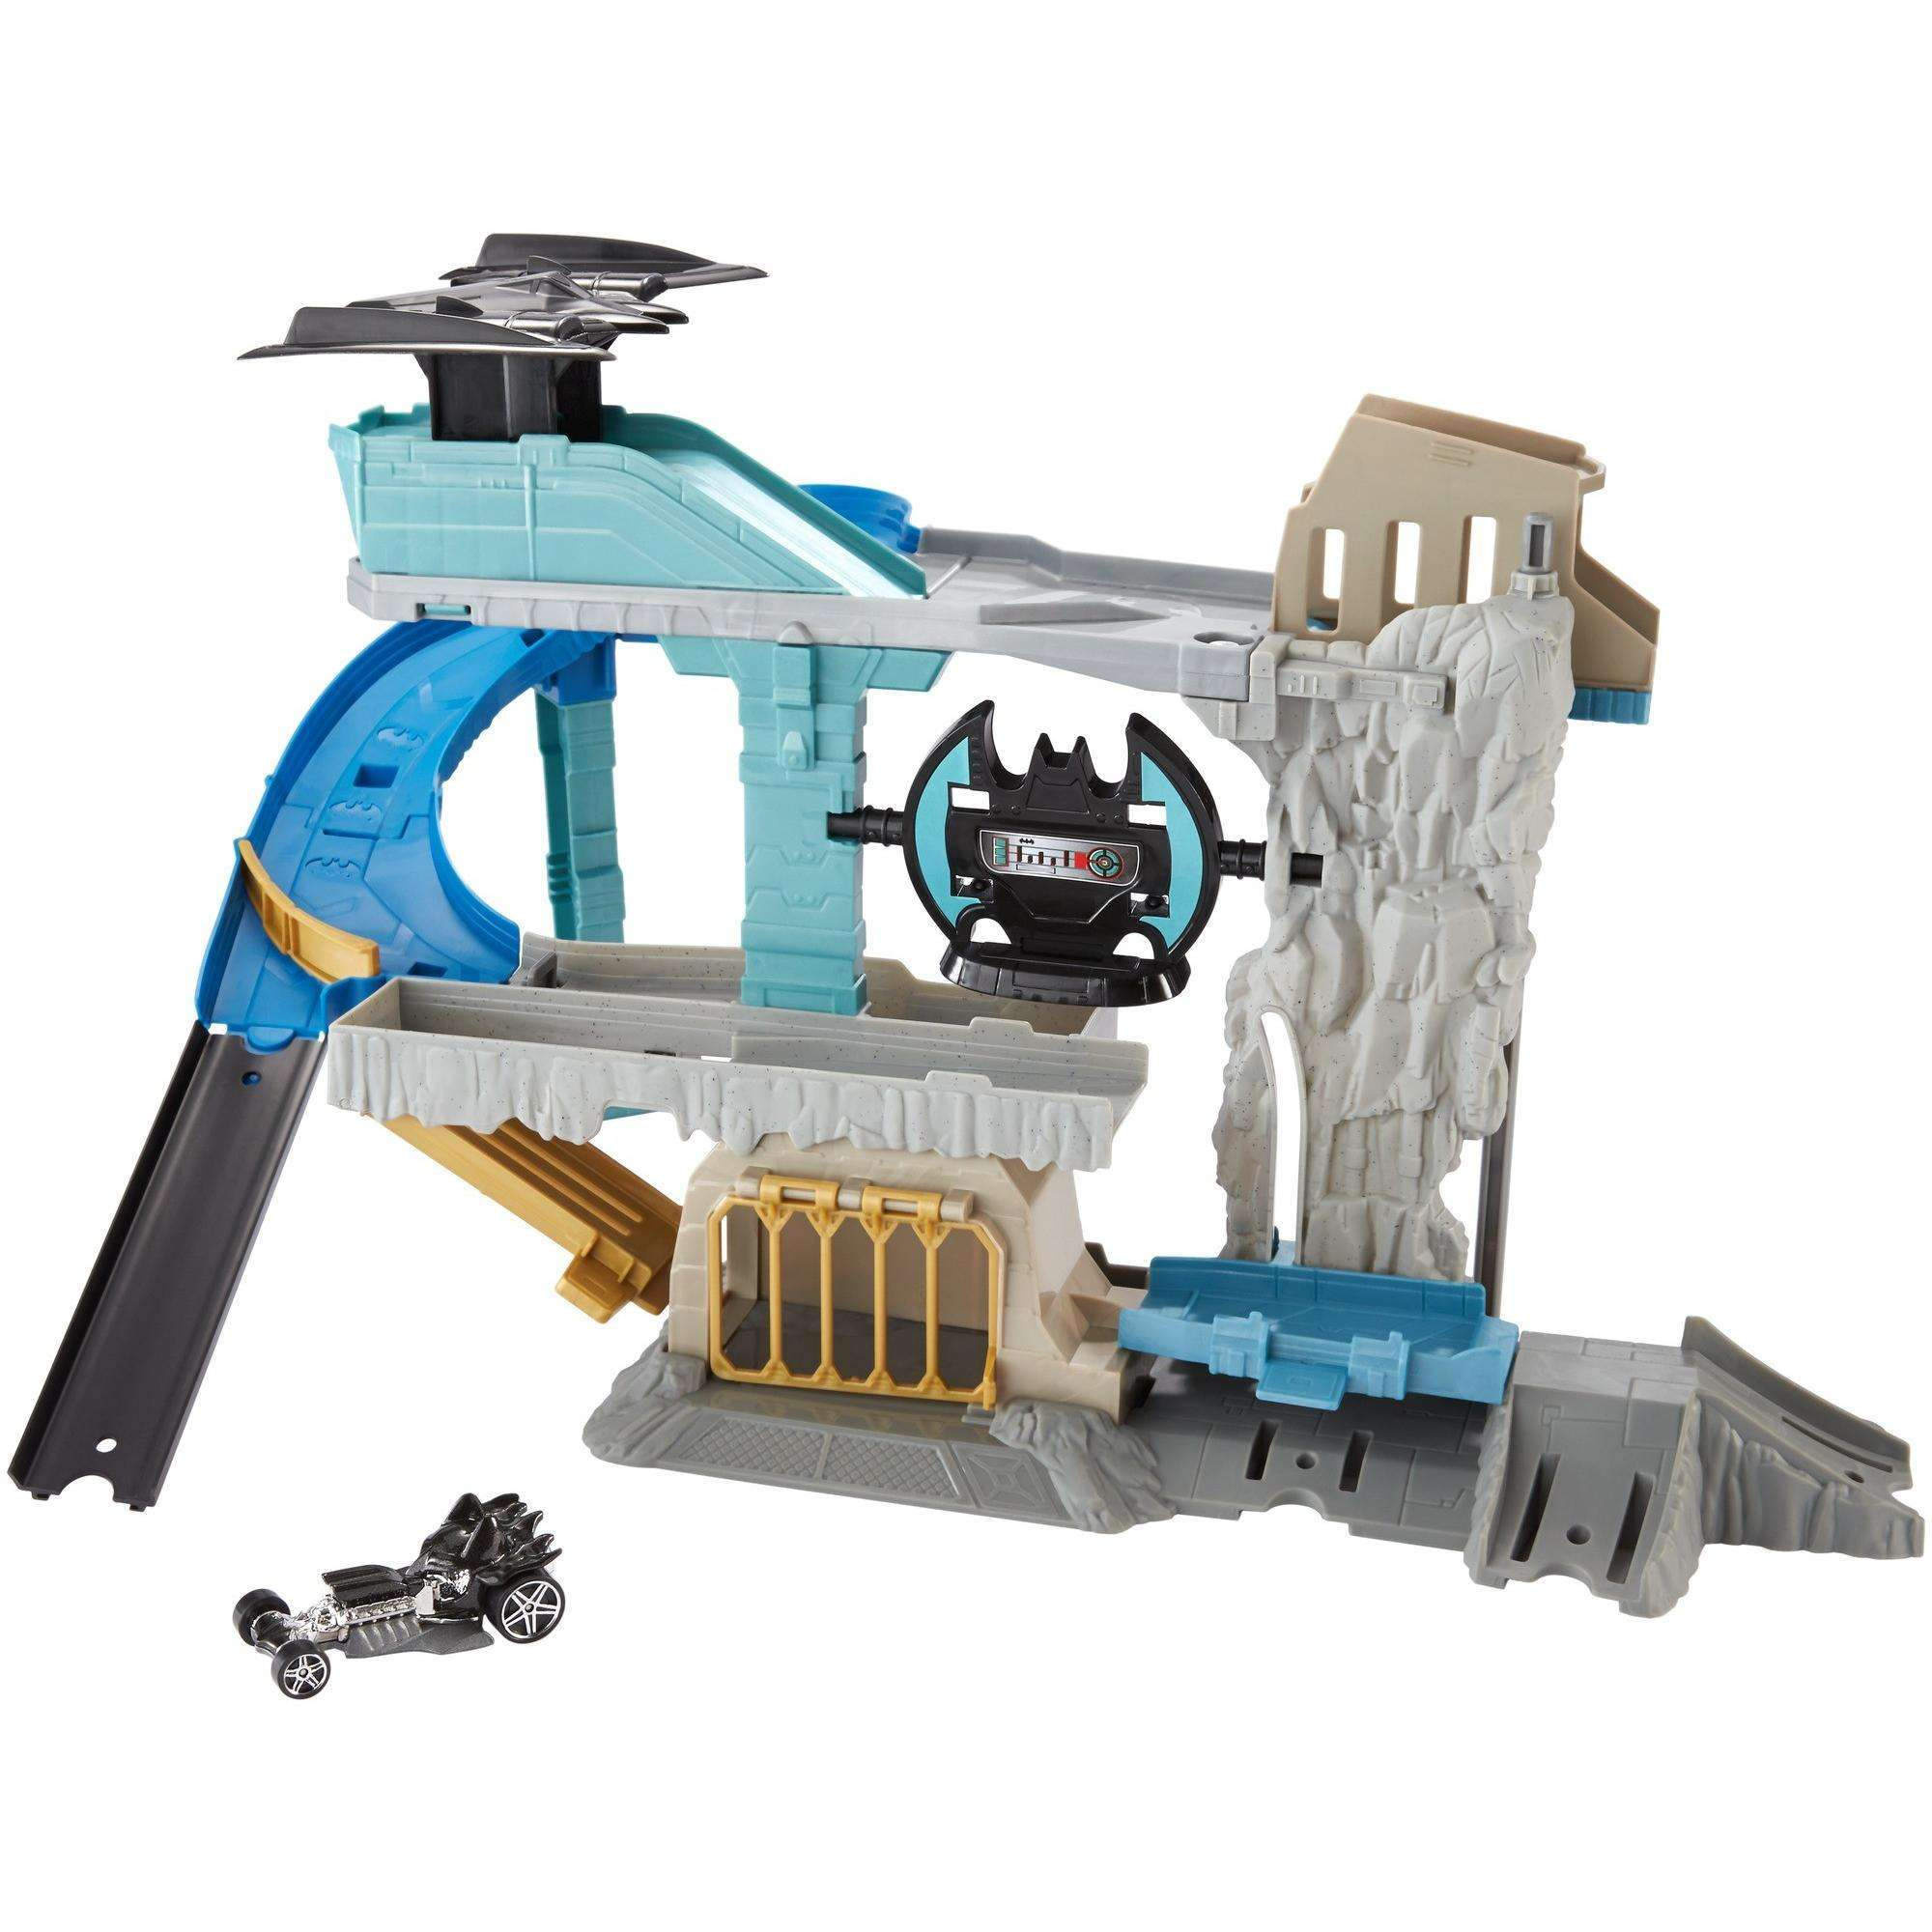 Hot Wheels DC Batcave Play Set by Mattel